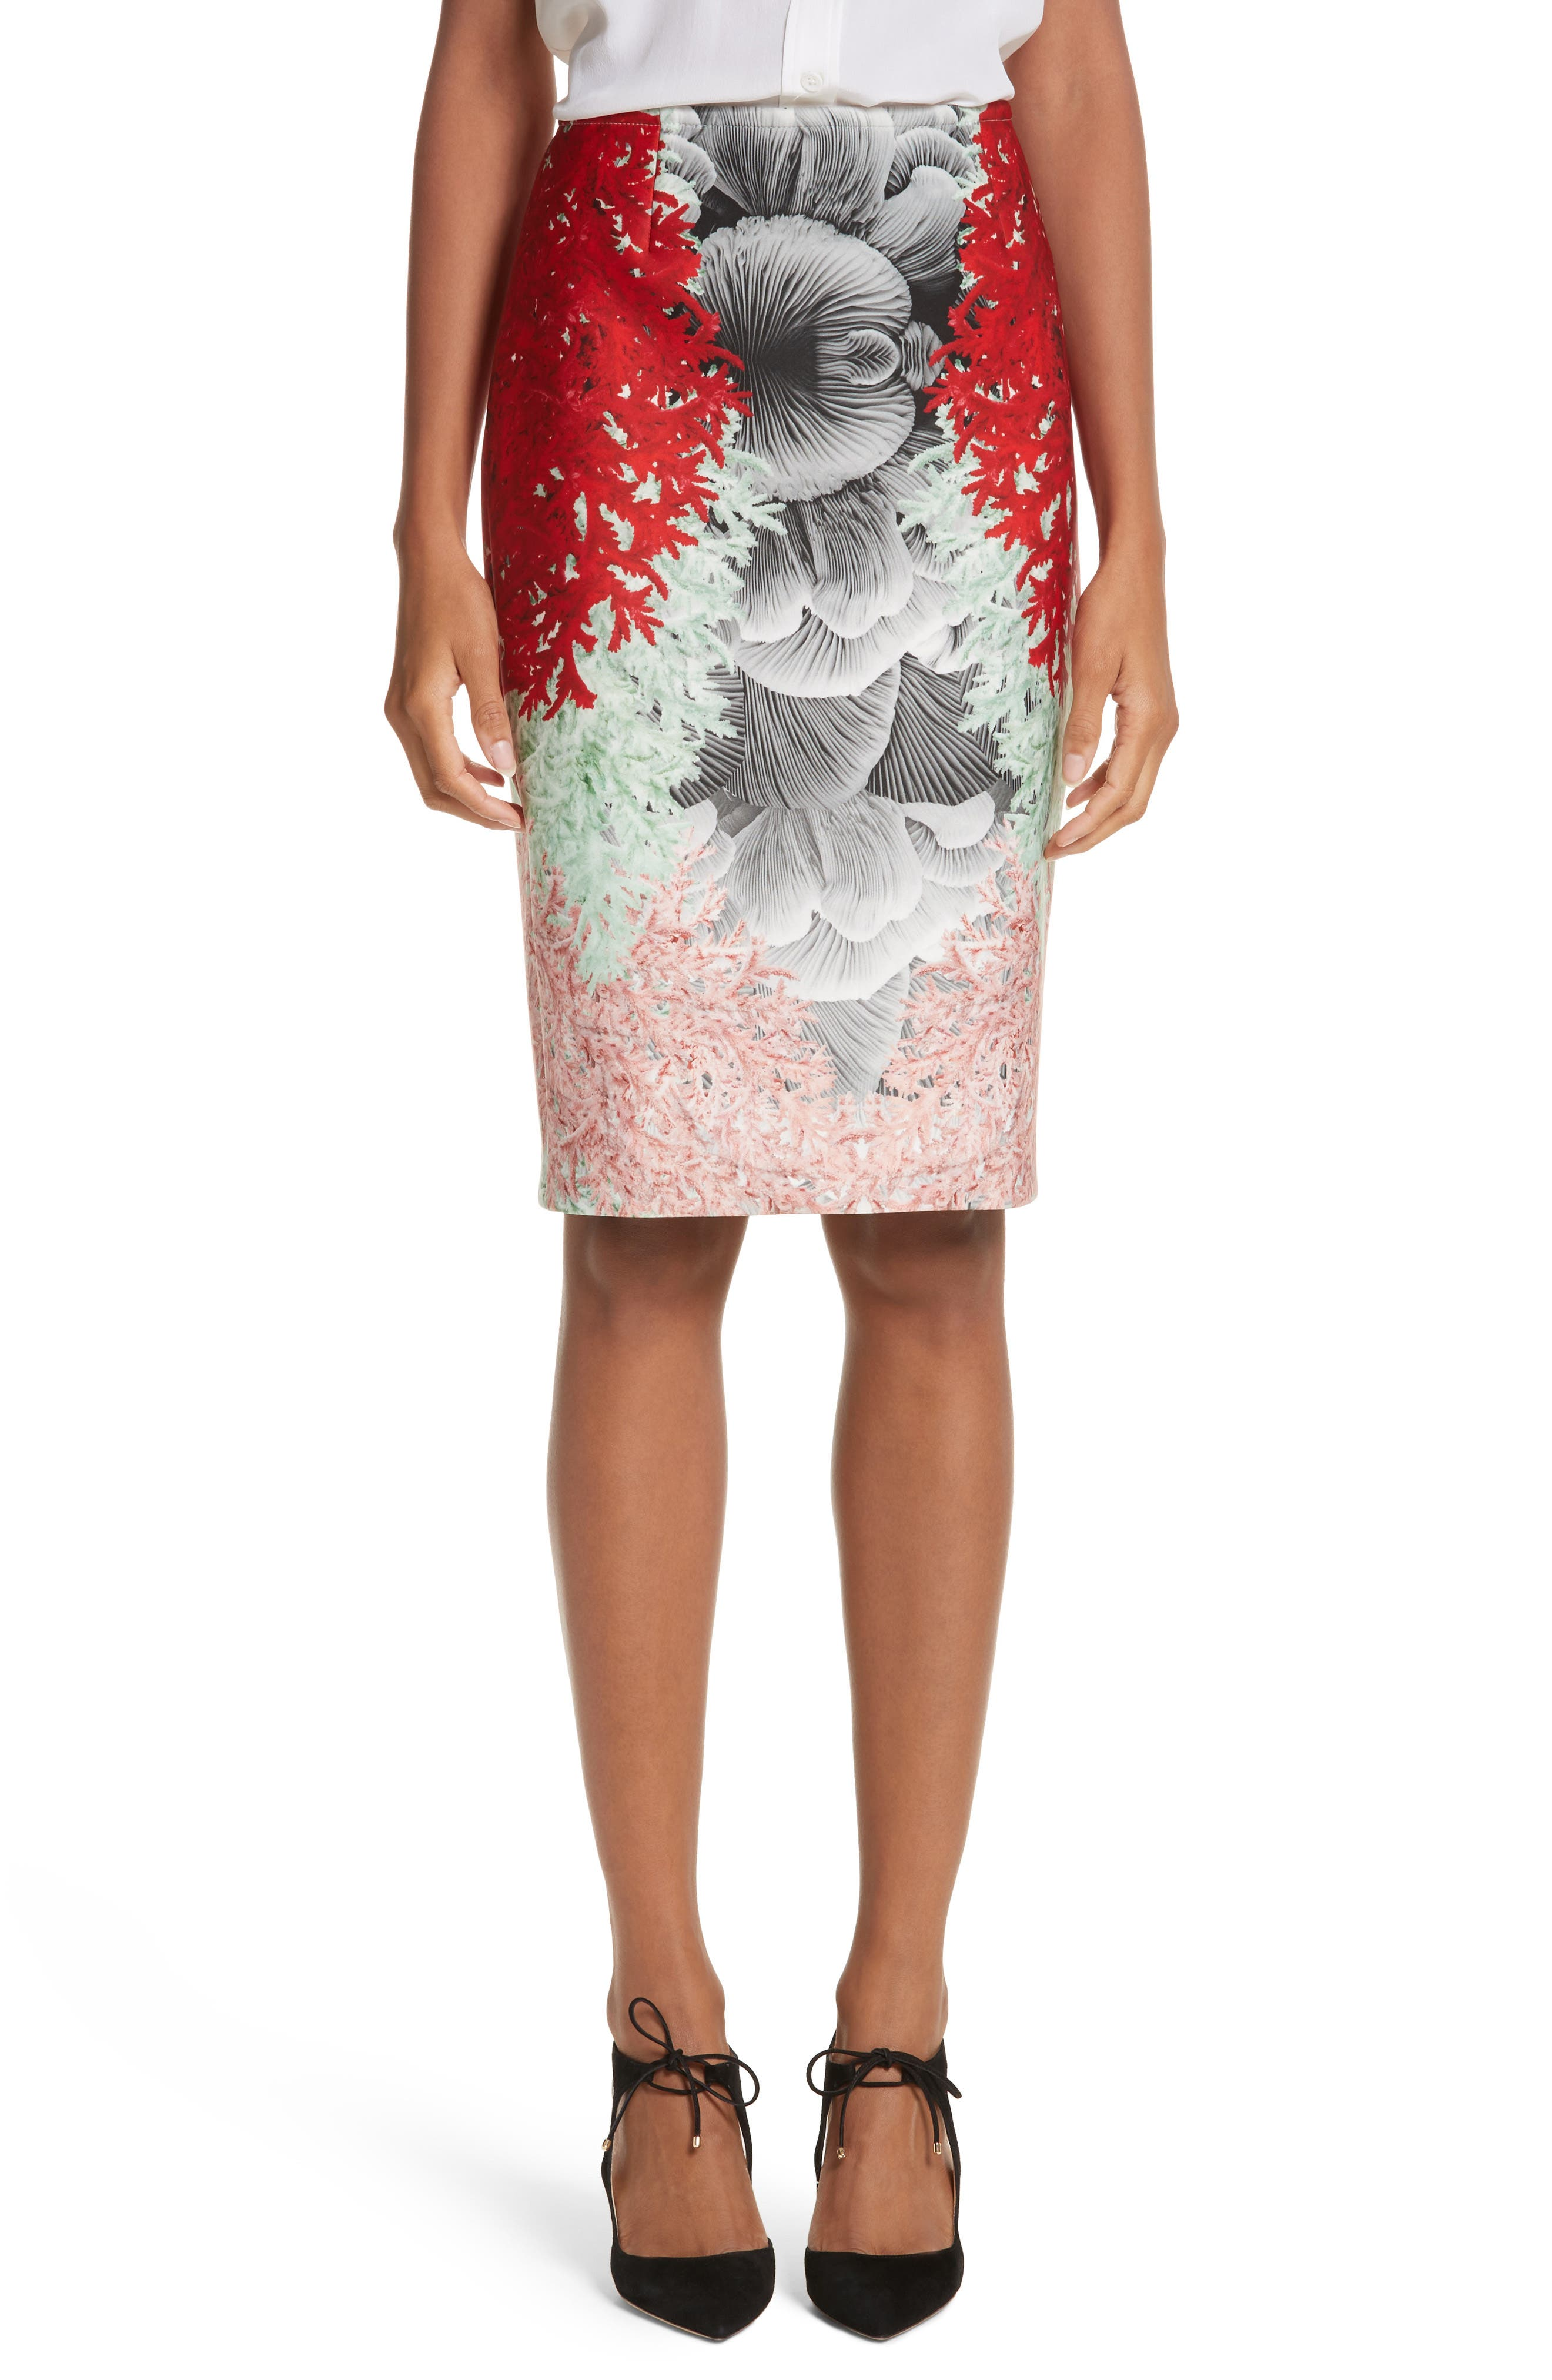 Alternate Image 1 Selected - Yigal Azrouël Coral Print Scuba Pencil Skirt